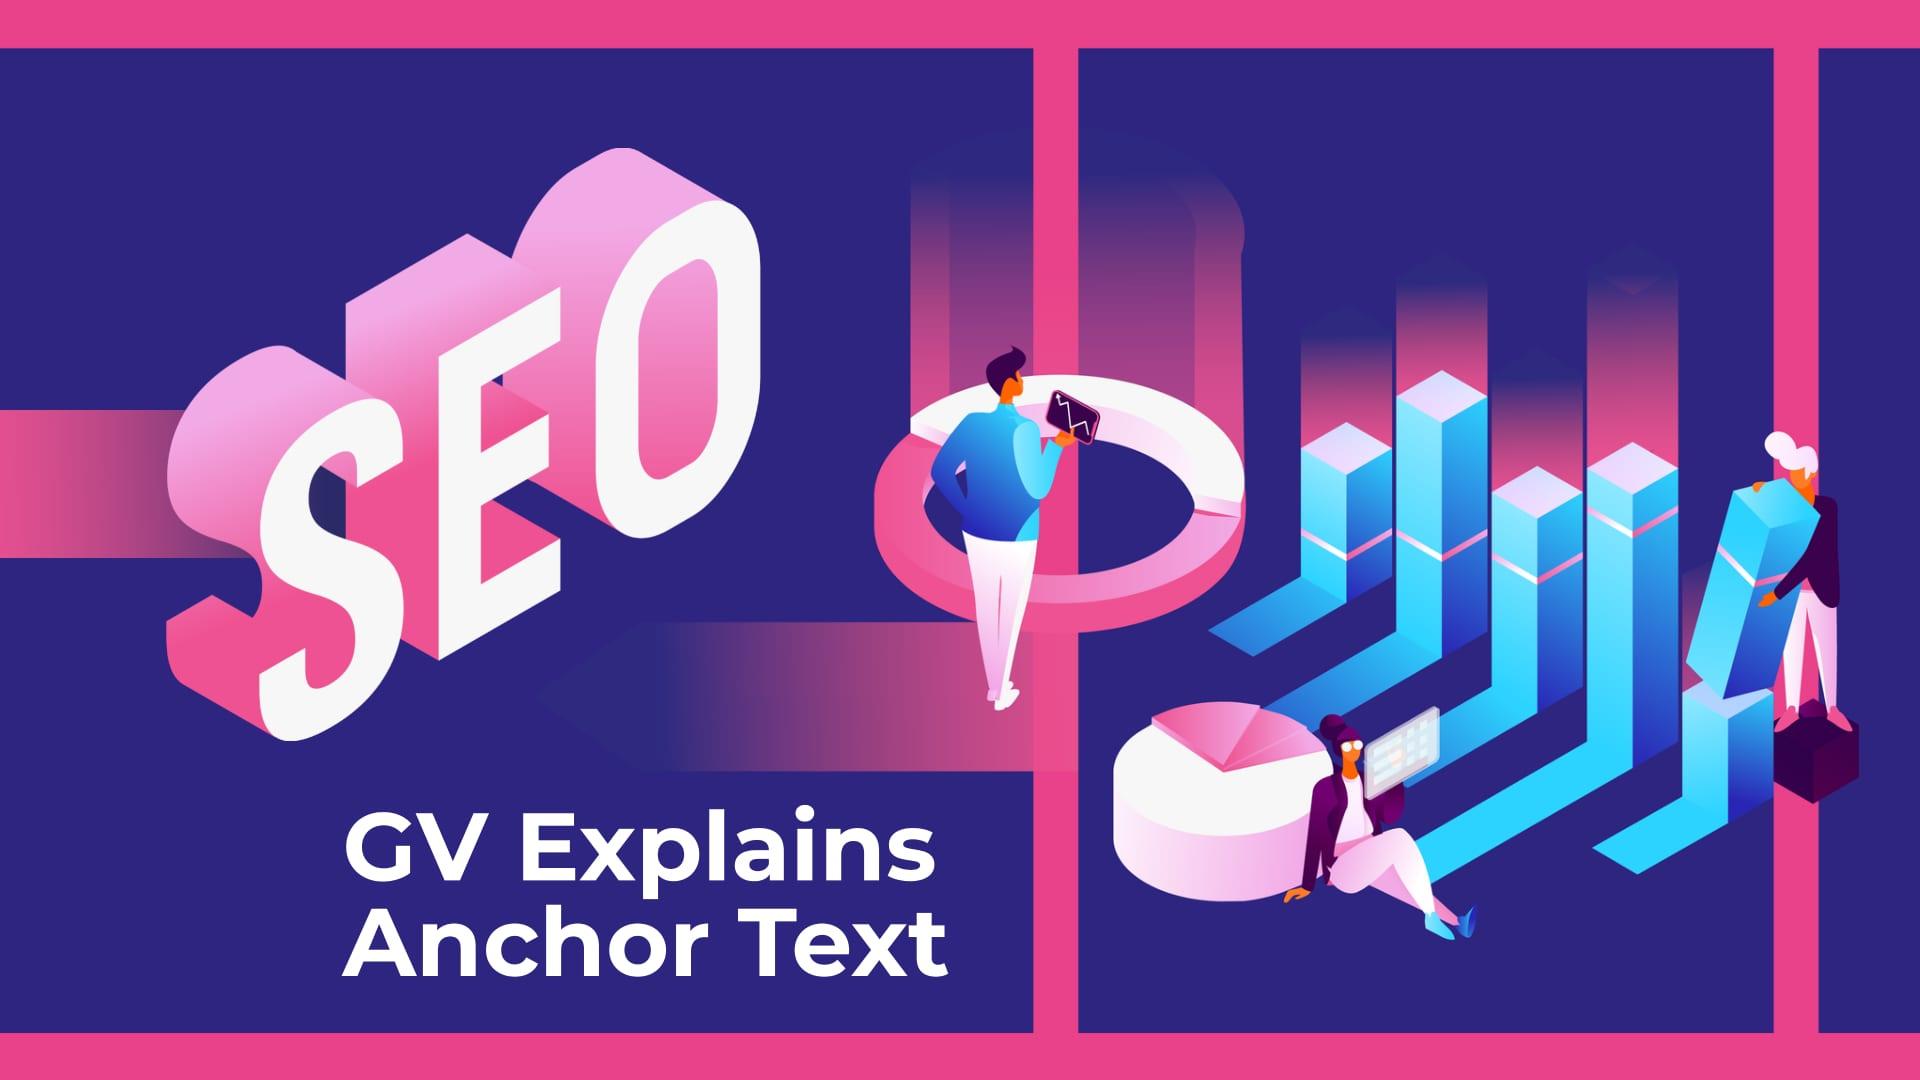 GV Explains Anchor Text SEO